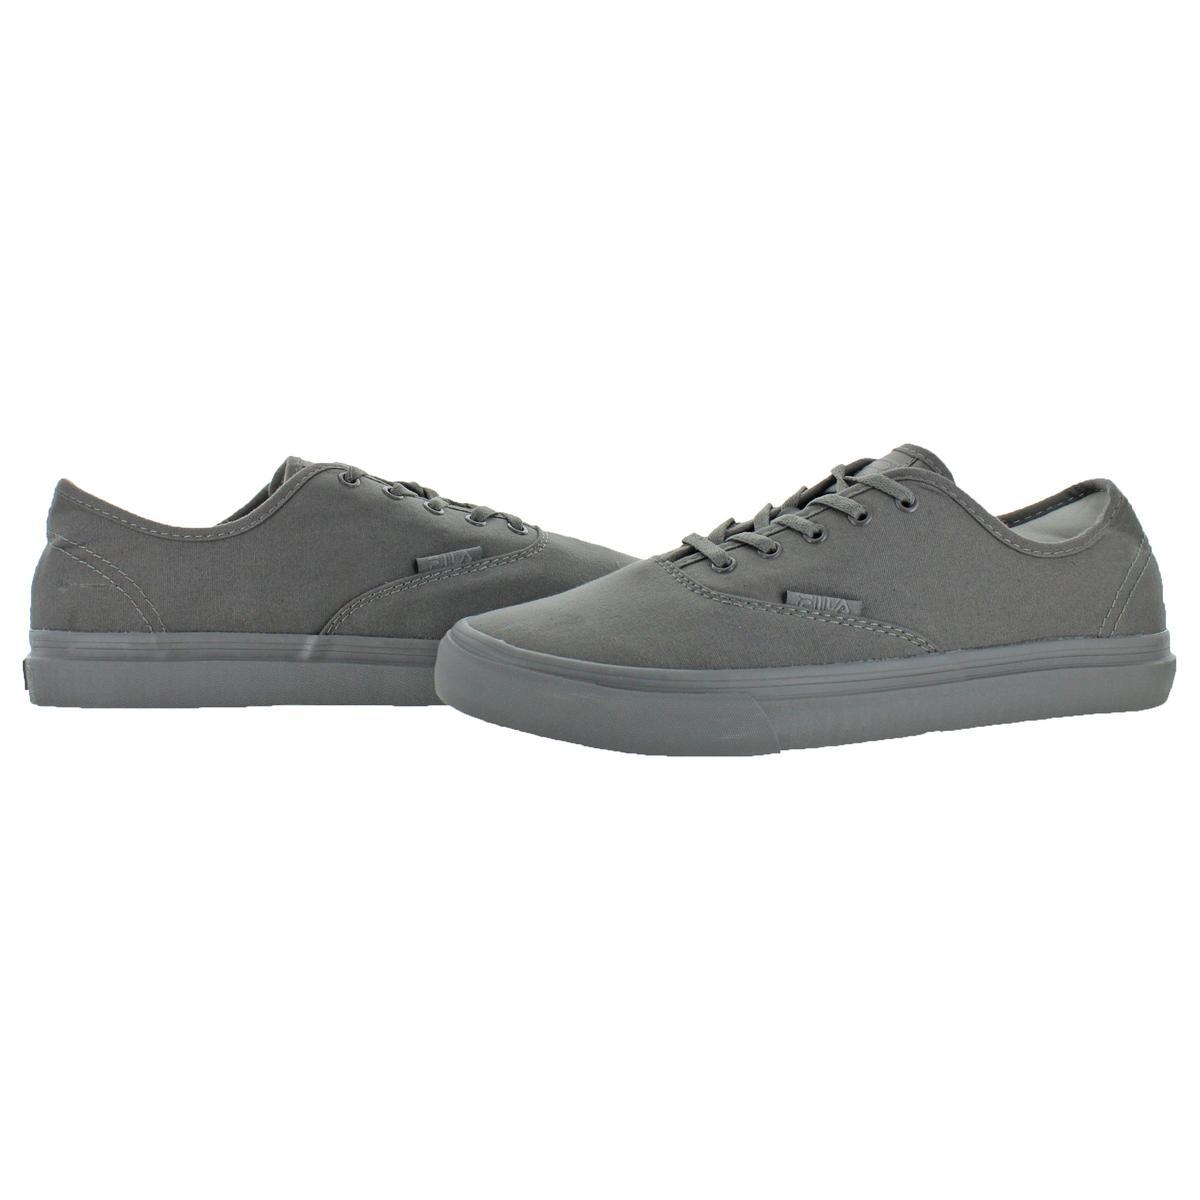 Fila-Classic-Canvas-Men-039-s-Fashion-Skate-Sneakers-Shoes thumbnail 3